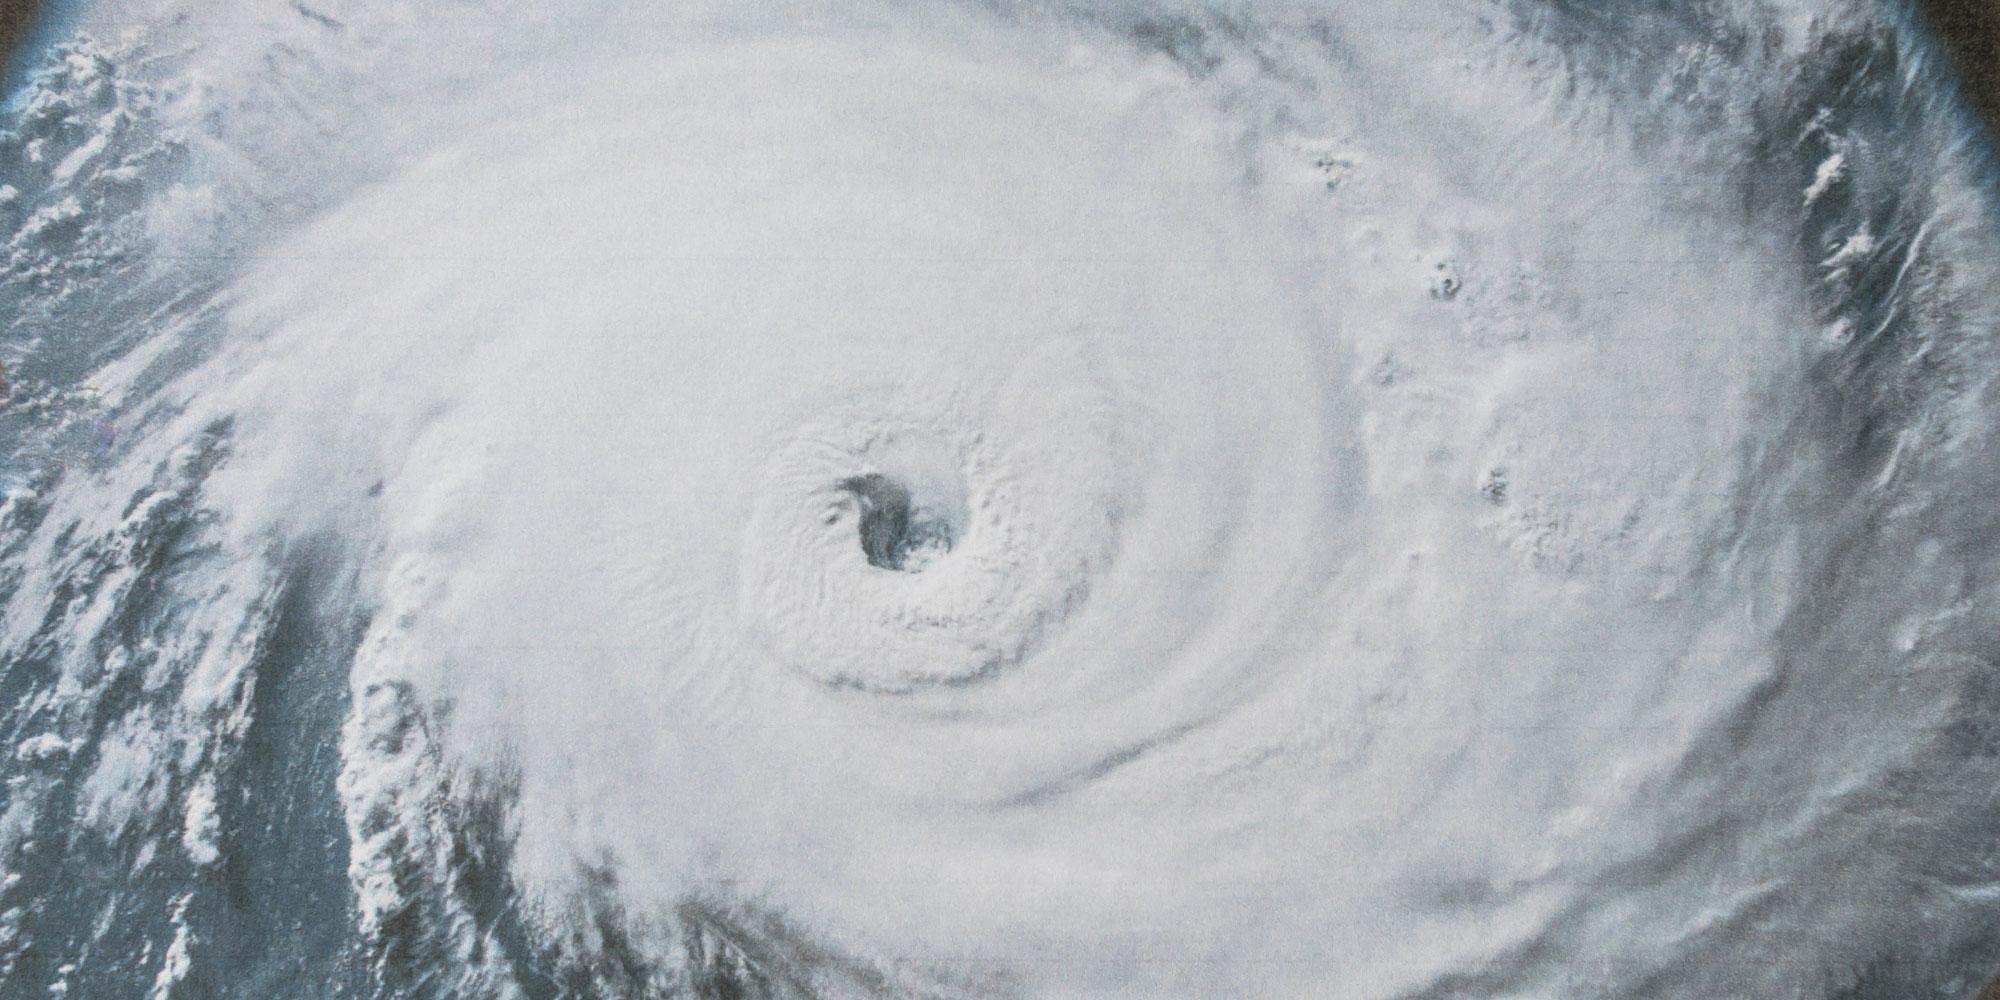 Foto satellitare di un ciclone